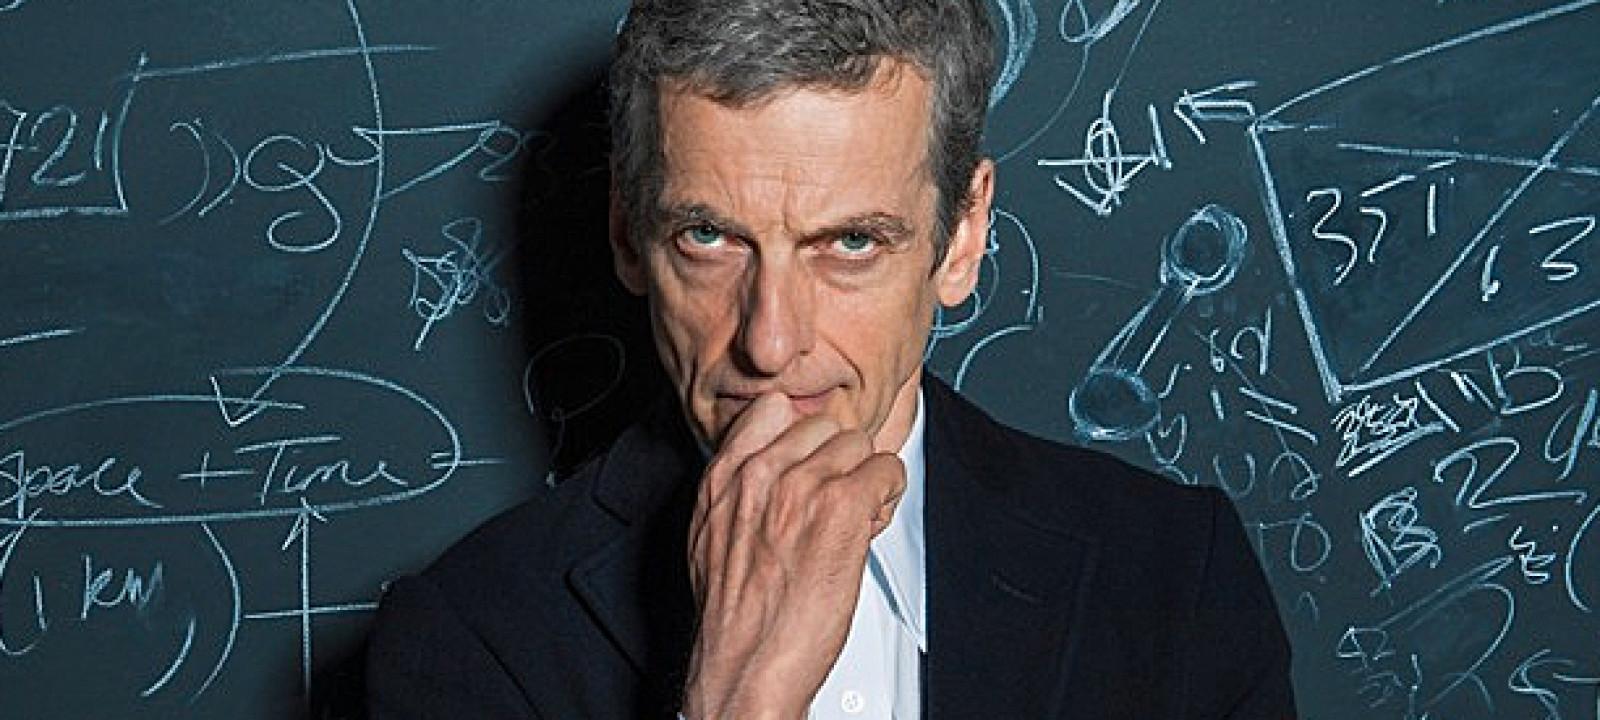 Doctor Who: Listen